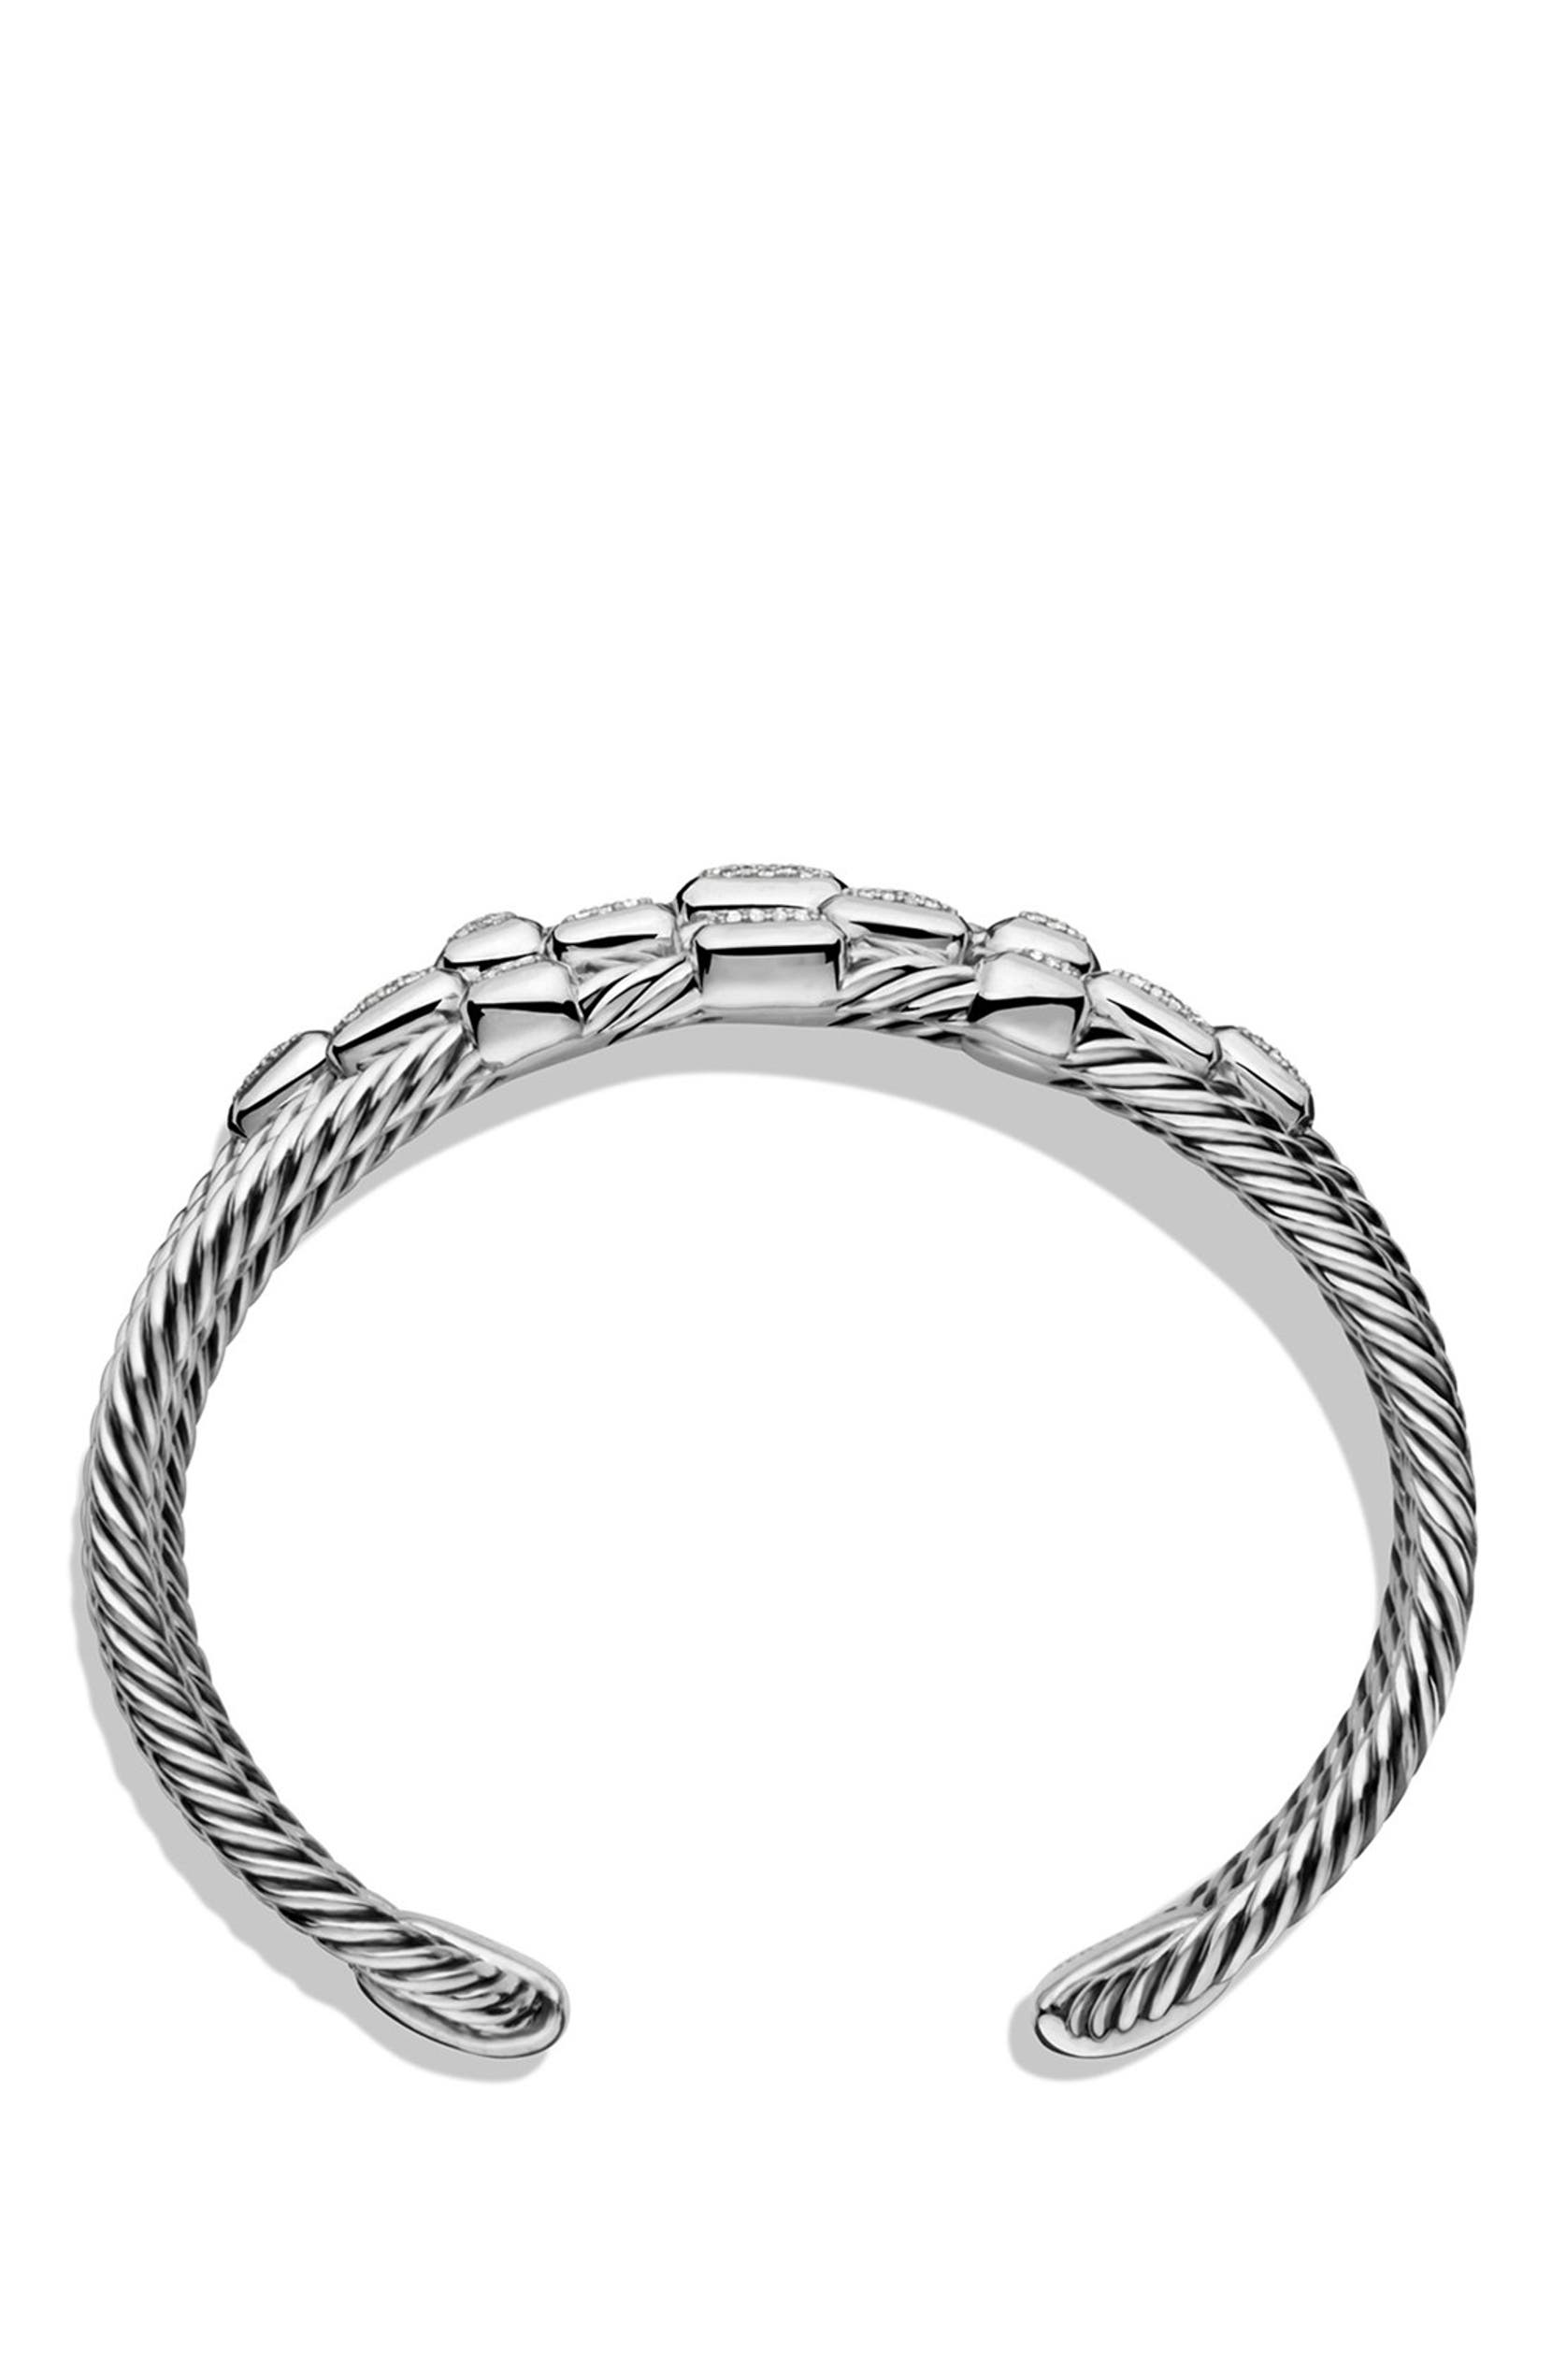 81f5f3bf5 David Yurman 'Confetti' Wide Cuff Bracelet with Diamonds   Nordstrom